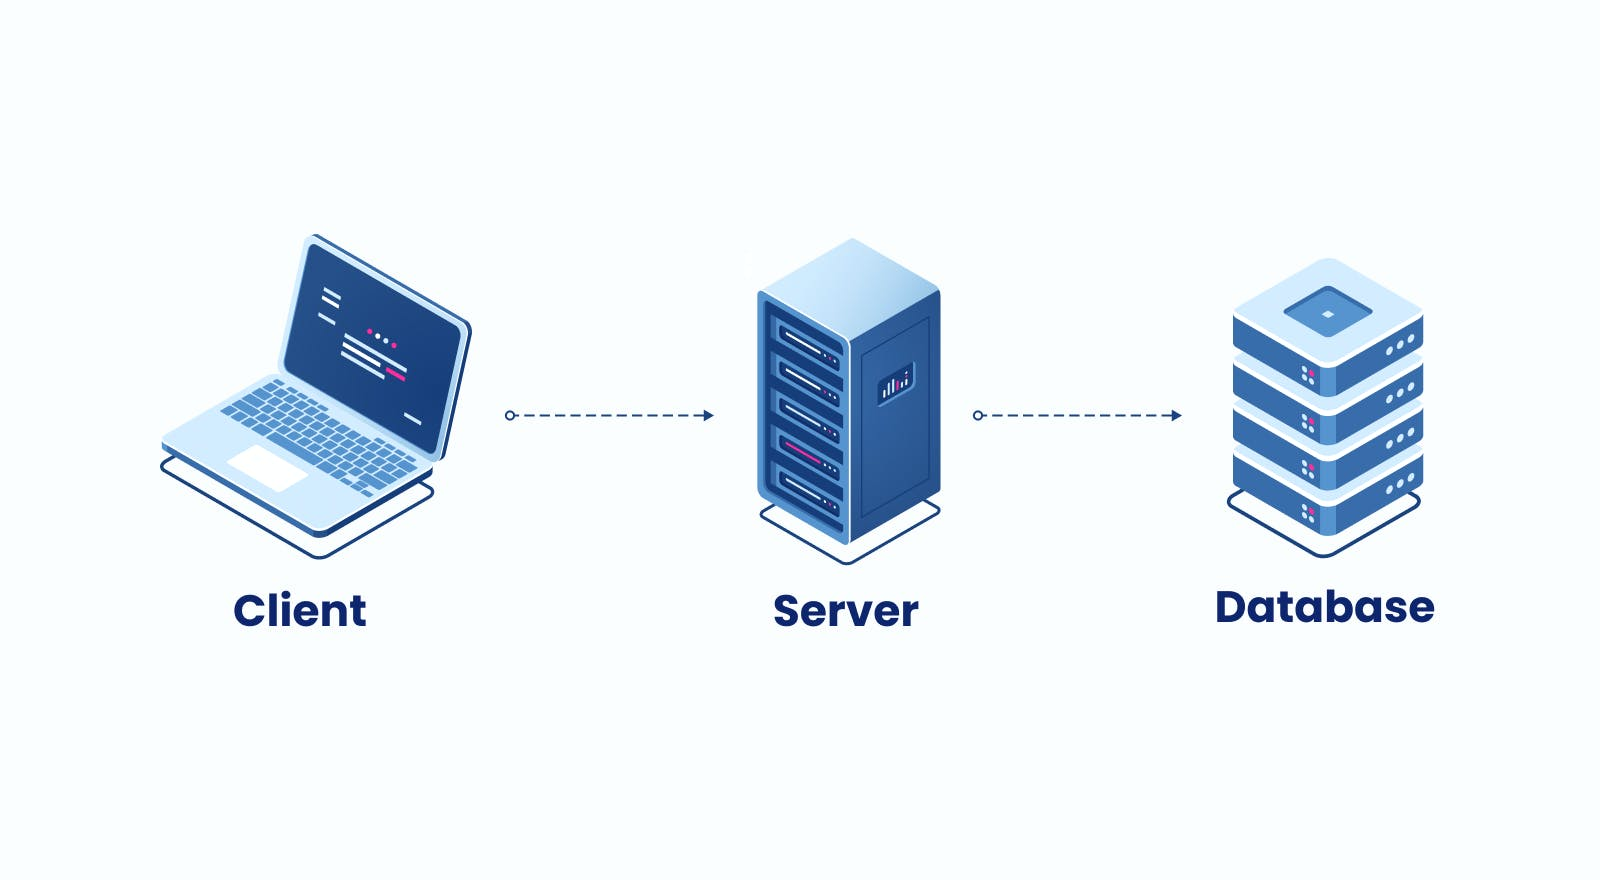 Database development : Client/server/database - how it works